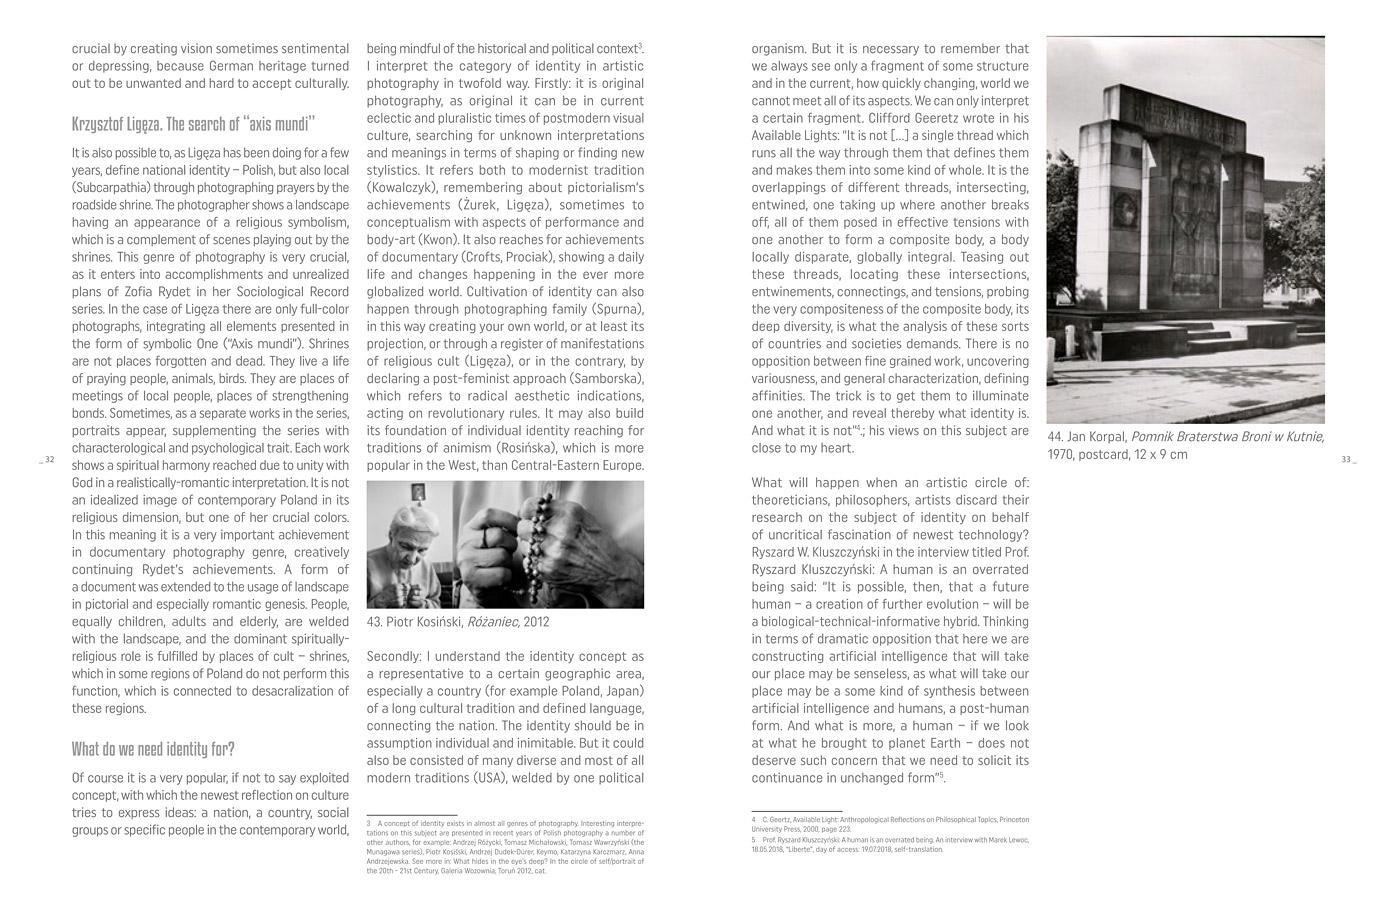 Exhibition catalogue with artists images & essay of dr Krzysztof Jurecki, graphic design by  A. Szuba